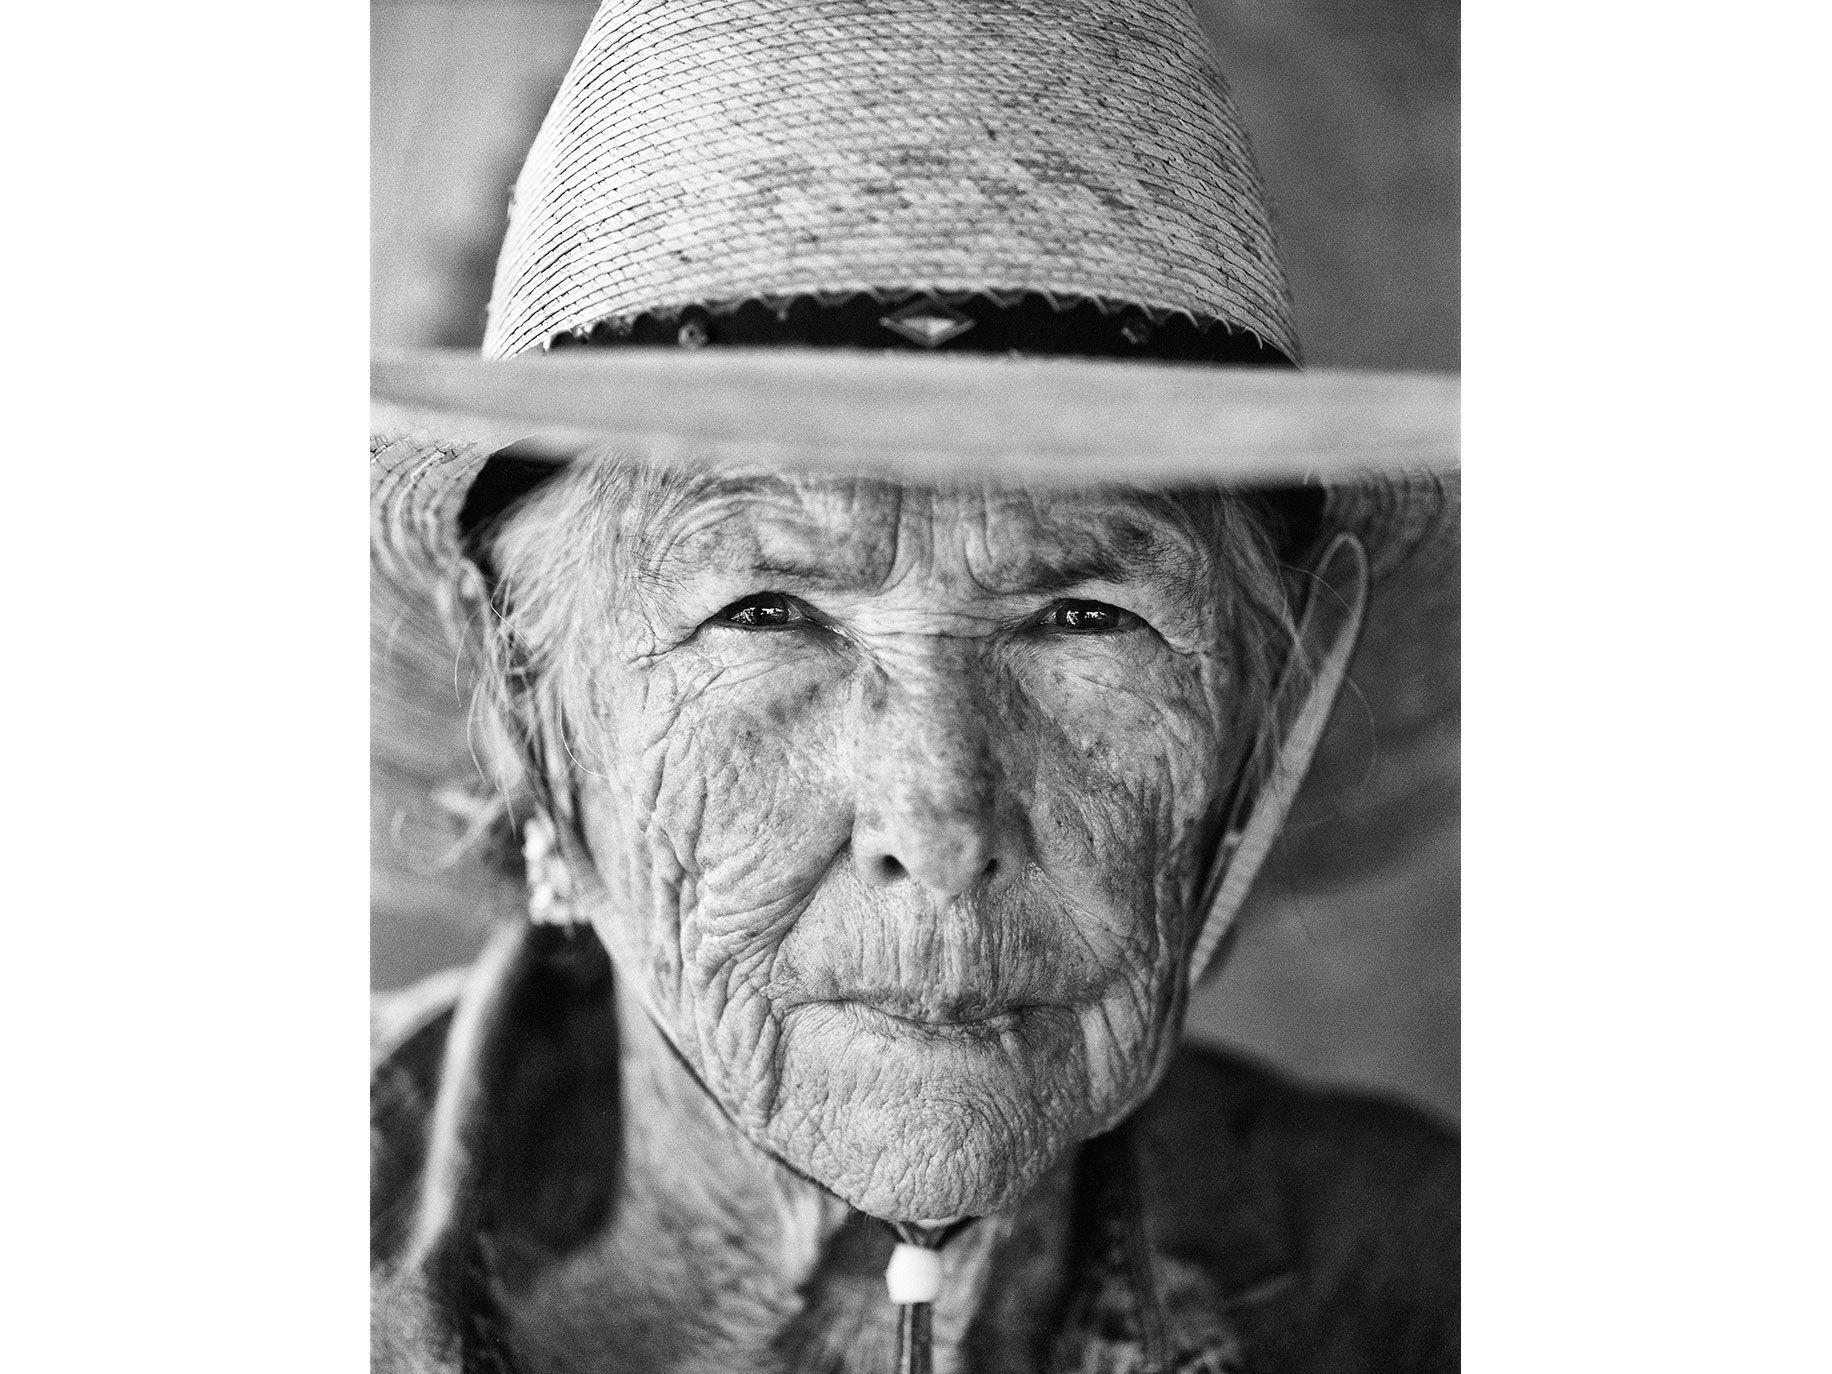 Connie Brown, H4 Ranch, Gila County, Punkin Center, Ariz., 2011.